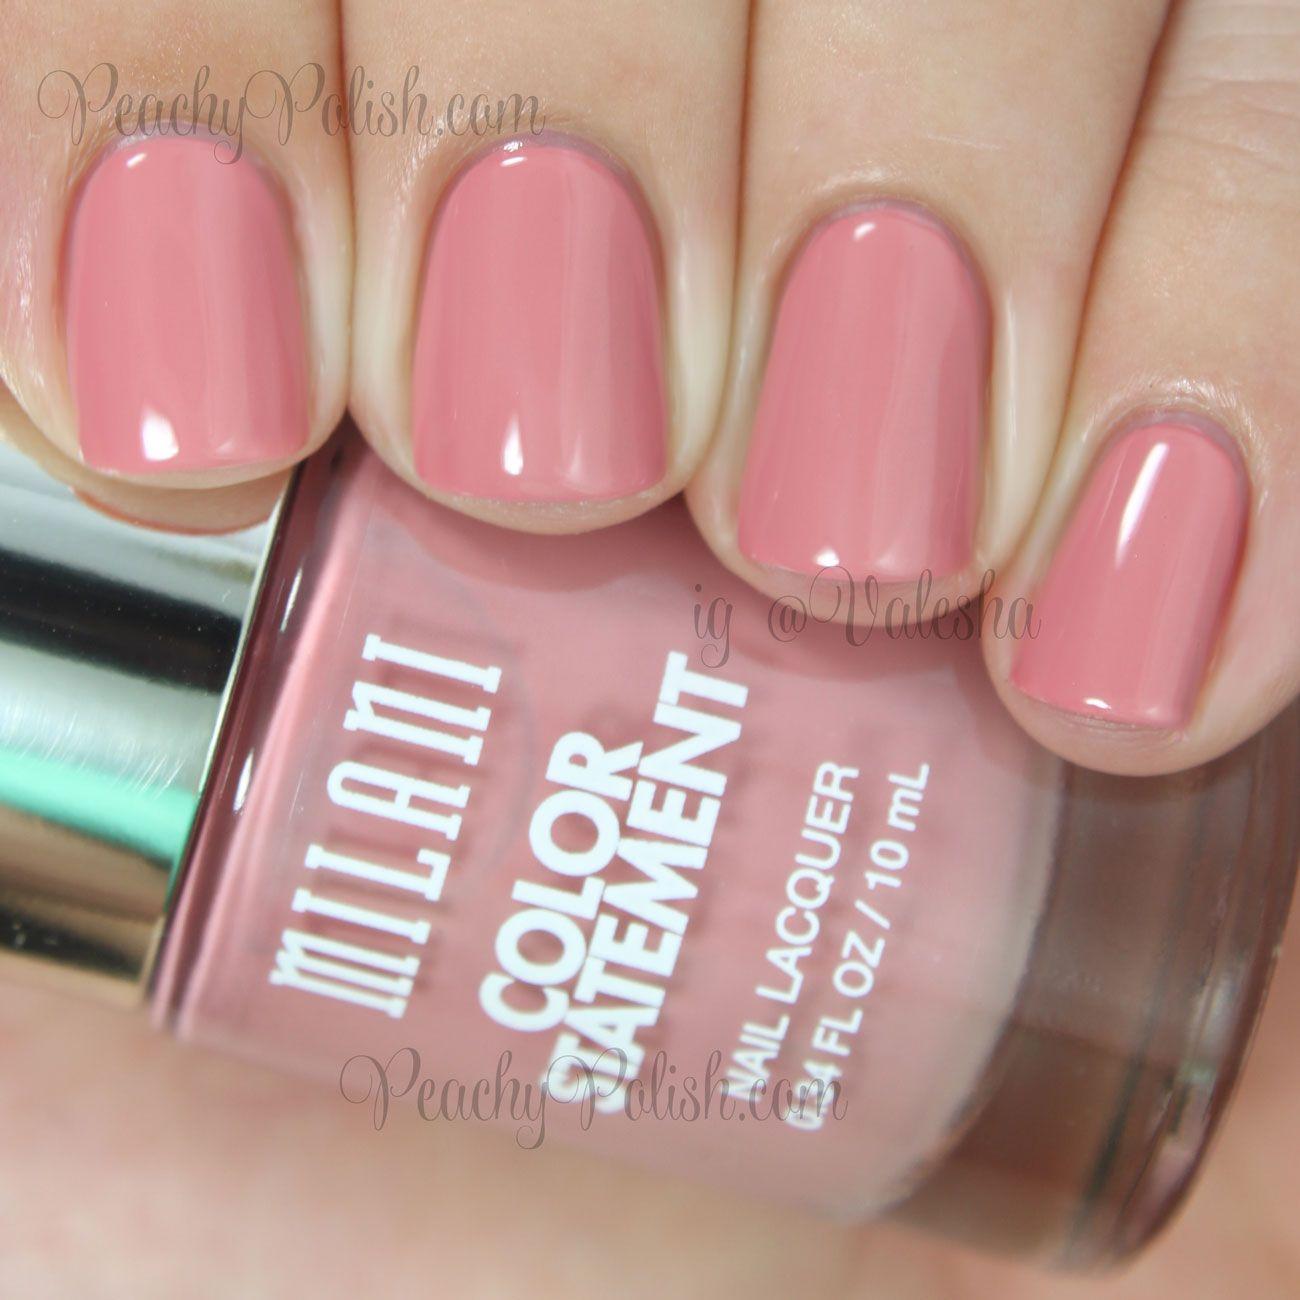 Milani Pink Beige Peachy Polish Beige Nails Statement Nail Nails